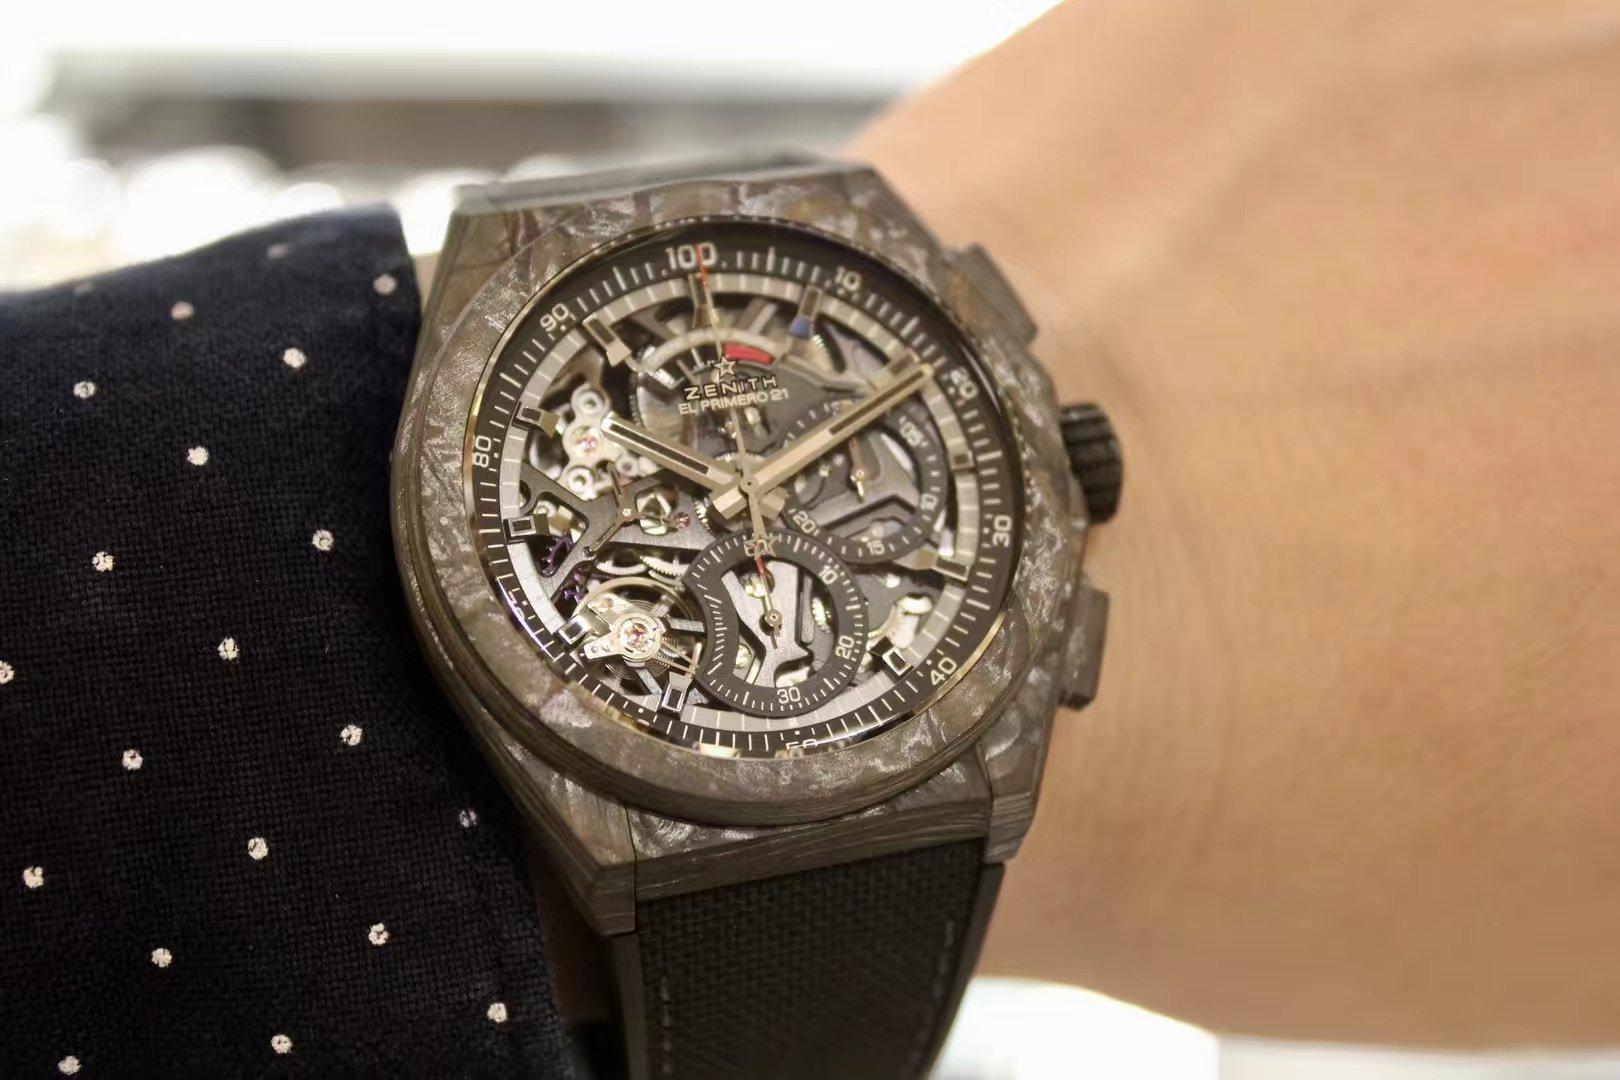 ZENITH真力时DEFY El Primero 21 系列镂空计时腕表,黑碳纤维材质10.9000.9004/96.R921插图1